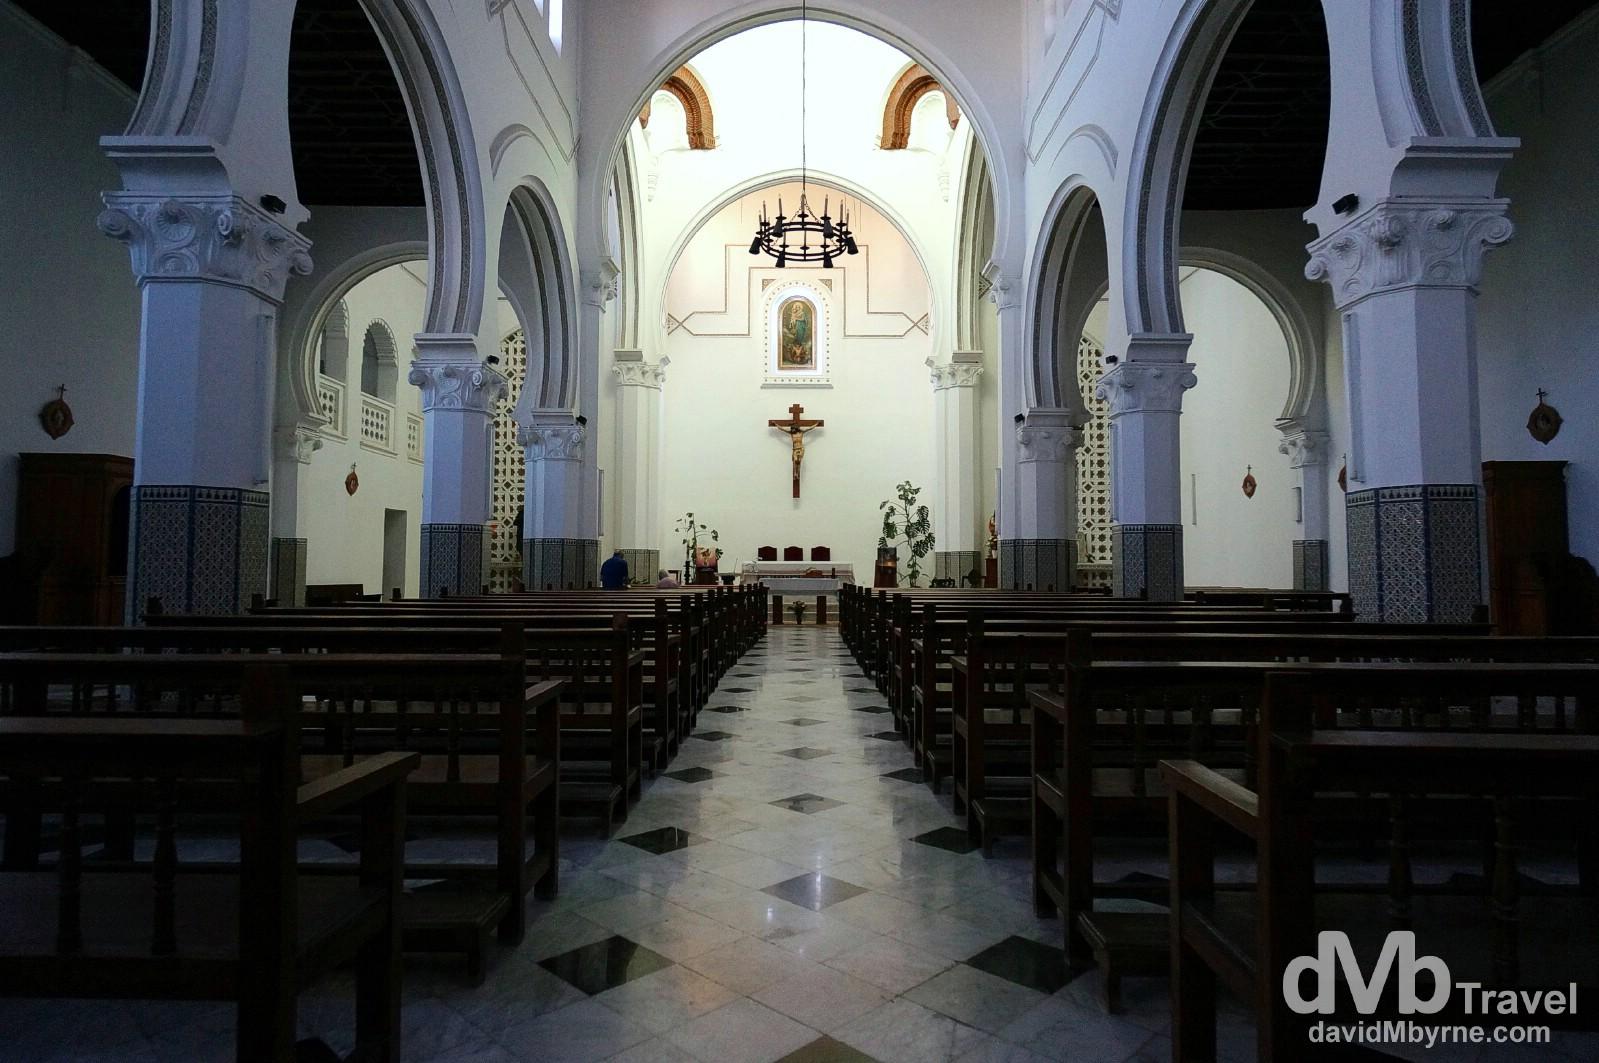 The 1917 Iglesia de Bacturia in Tetouan, Morocco. June 2nd, 2014.